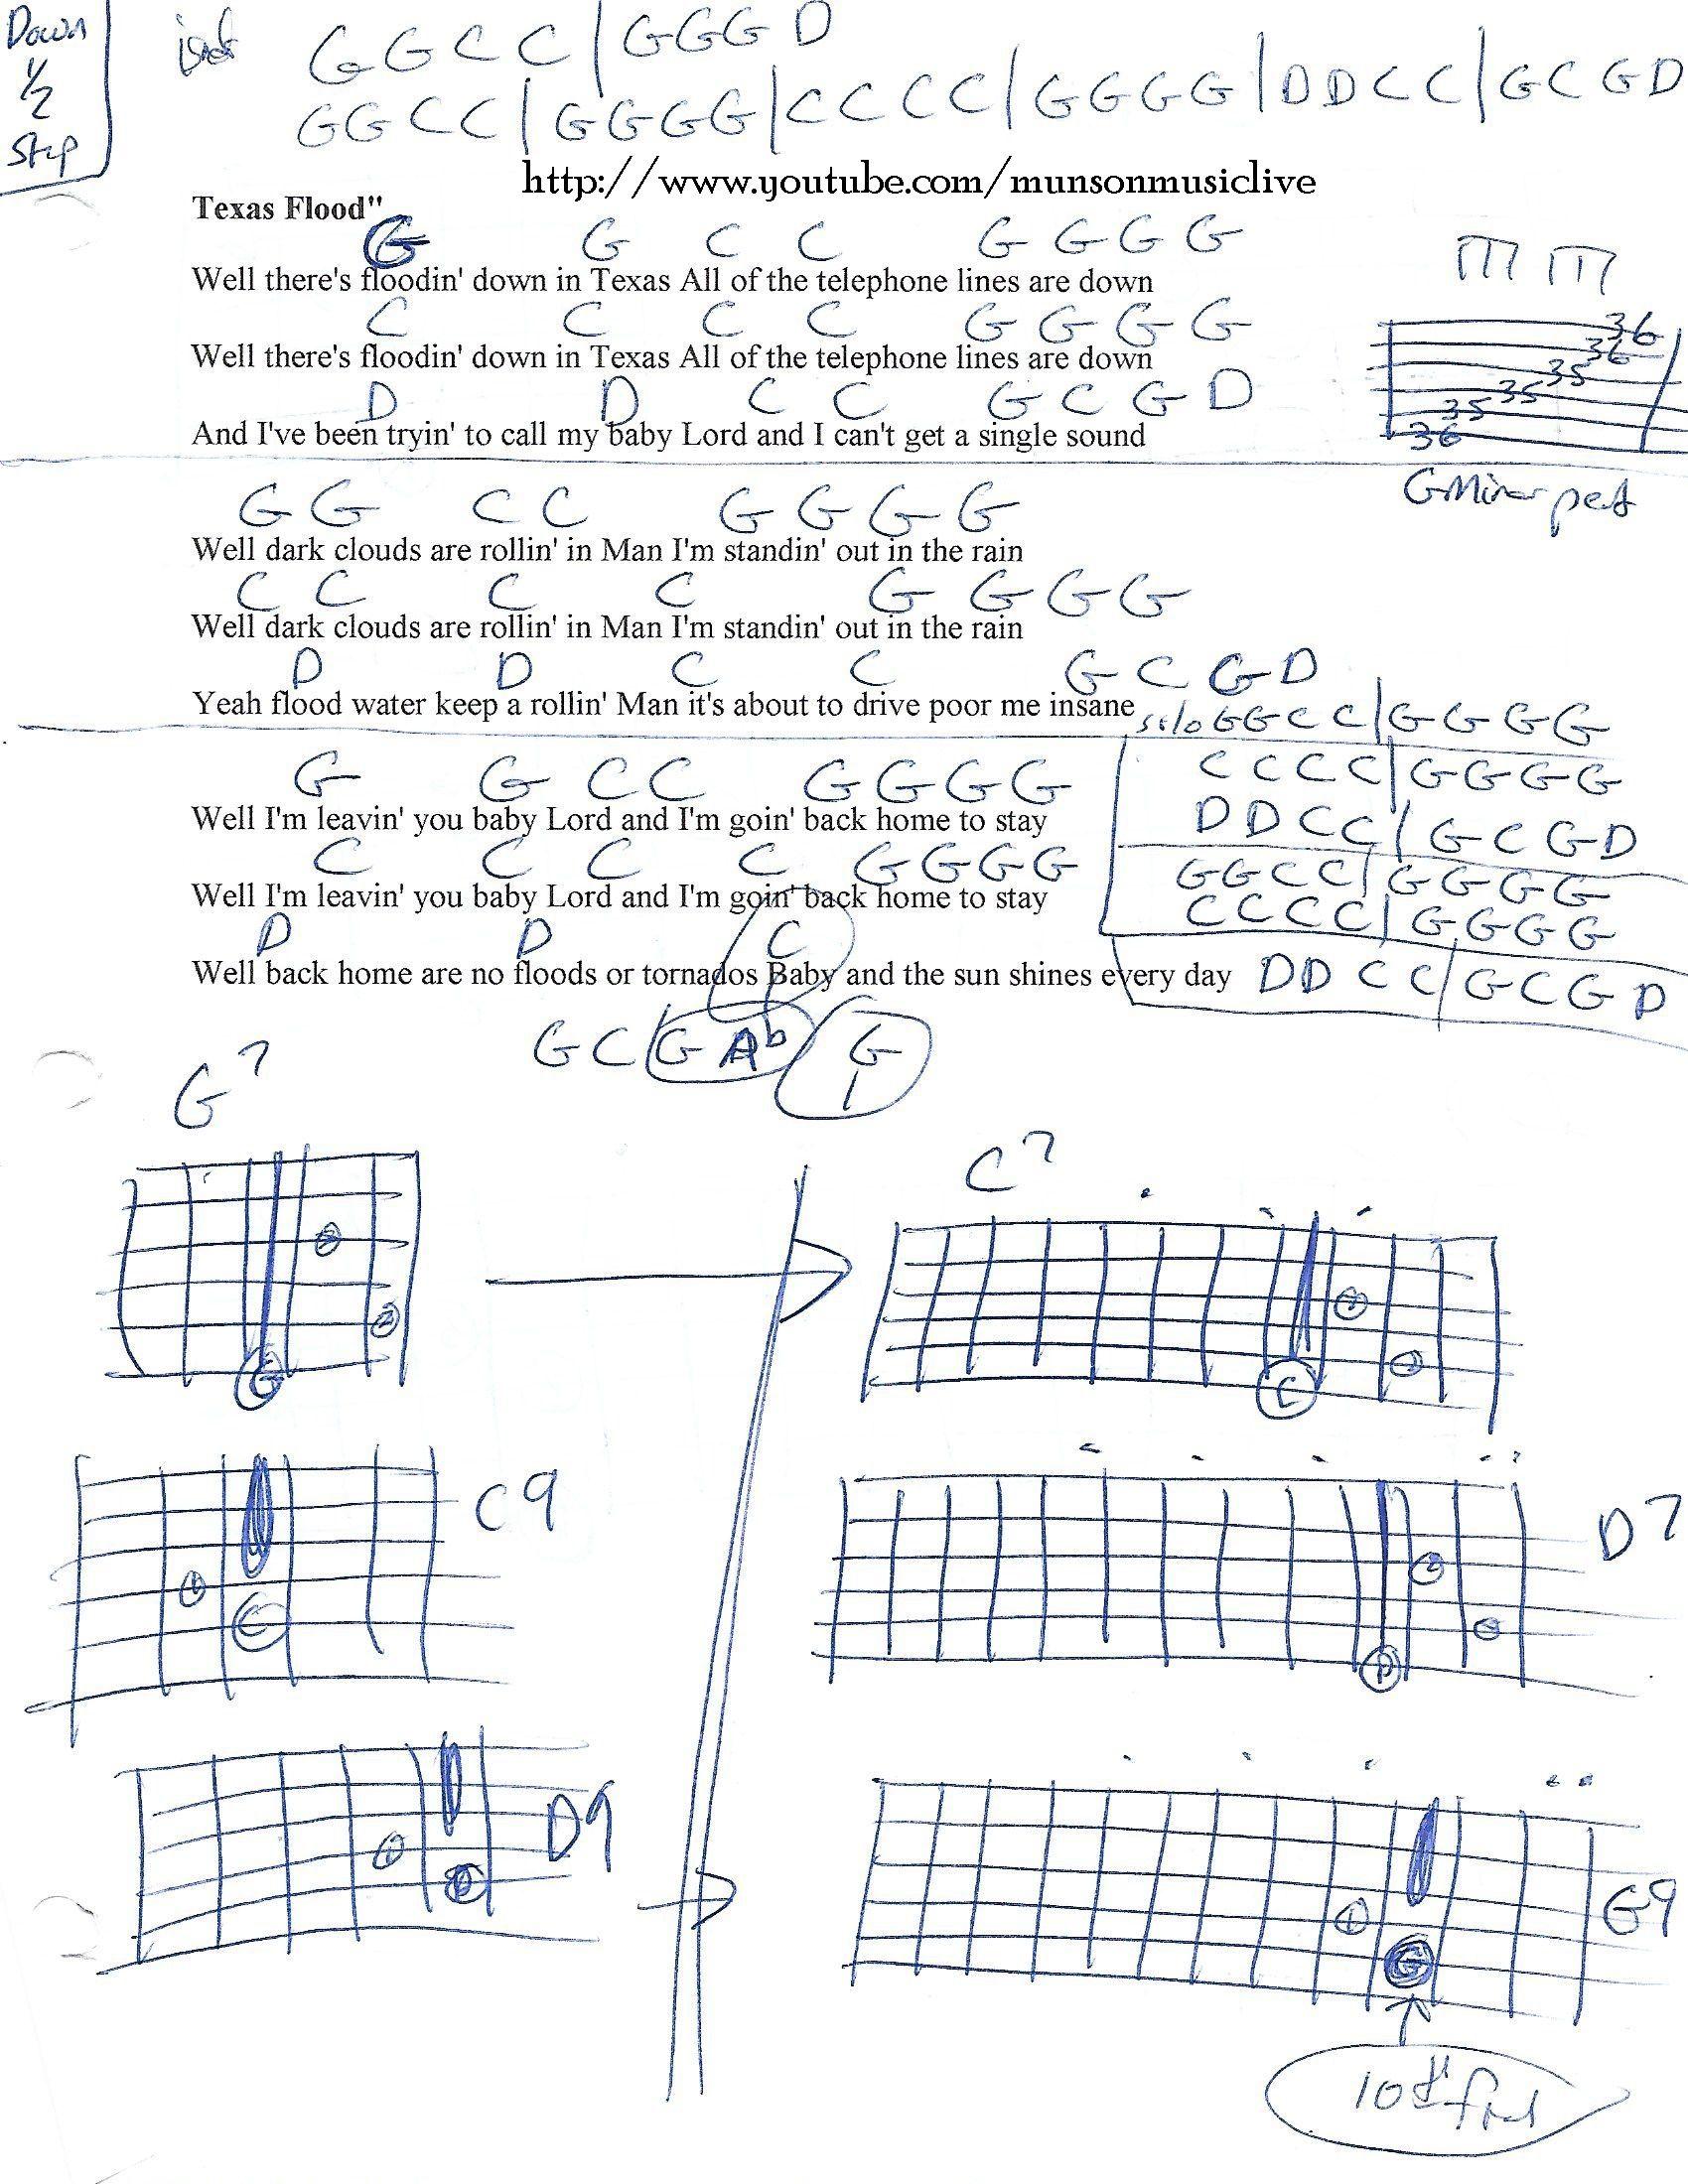 Texas flood srv guitar chord chart guitar lesson chord charts texas flood srv guitar chord chart hexwebz Choice Image